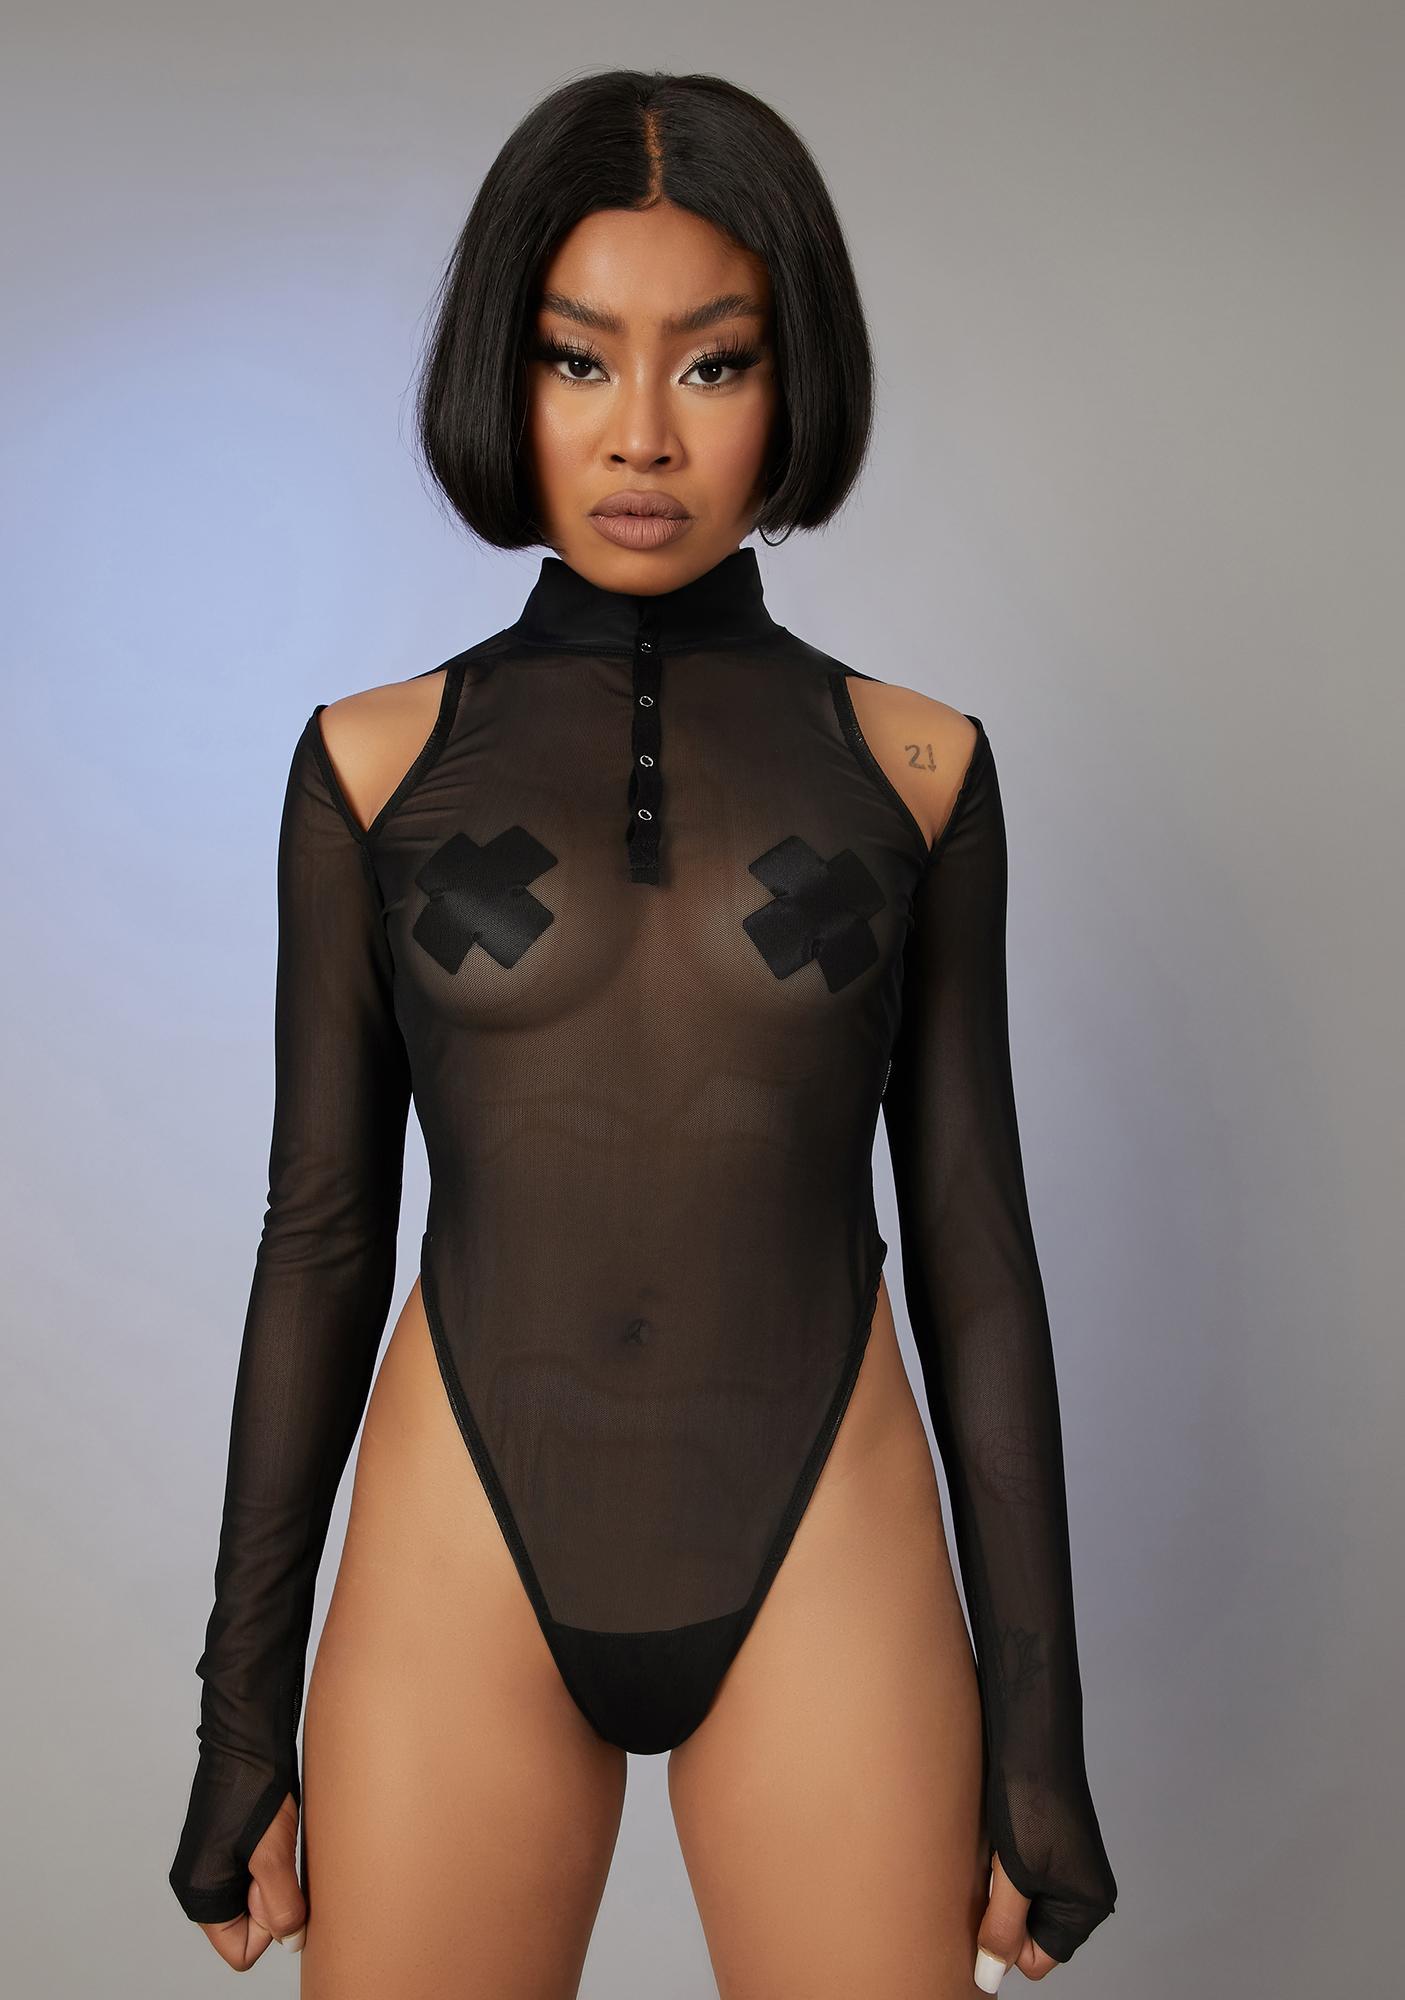 Poster Grl Paparazzi Pleaser Mesh Bodysuit